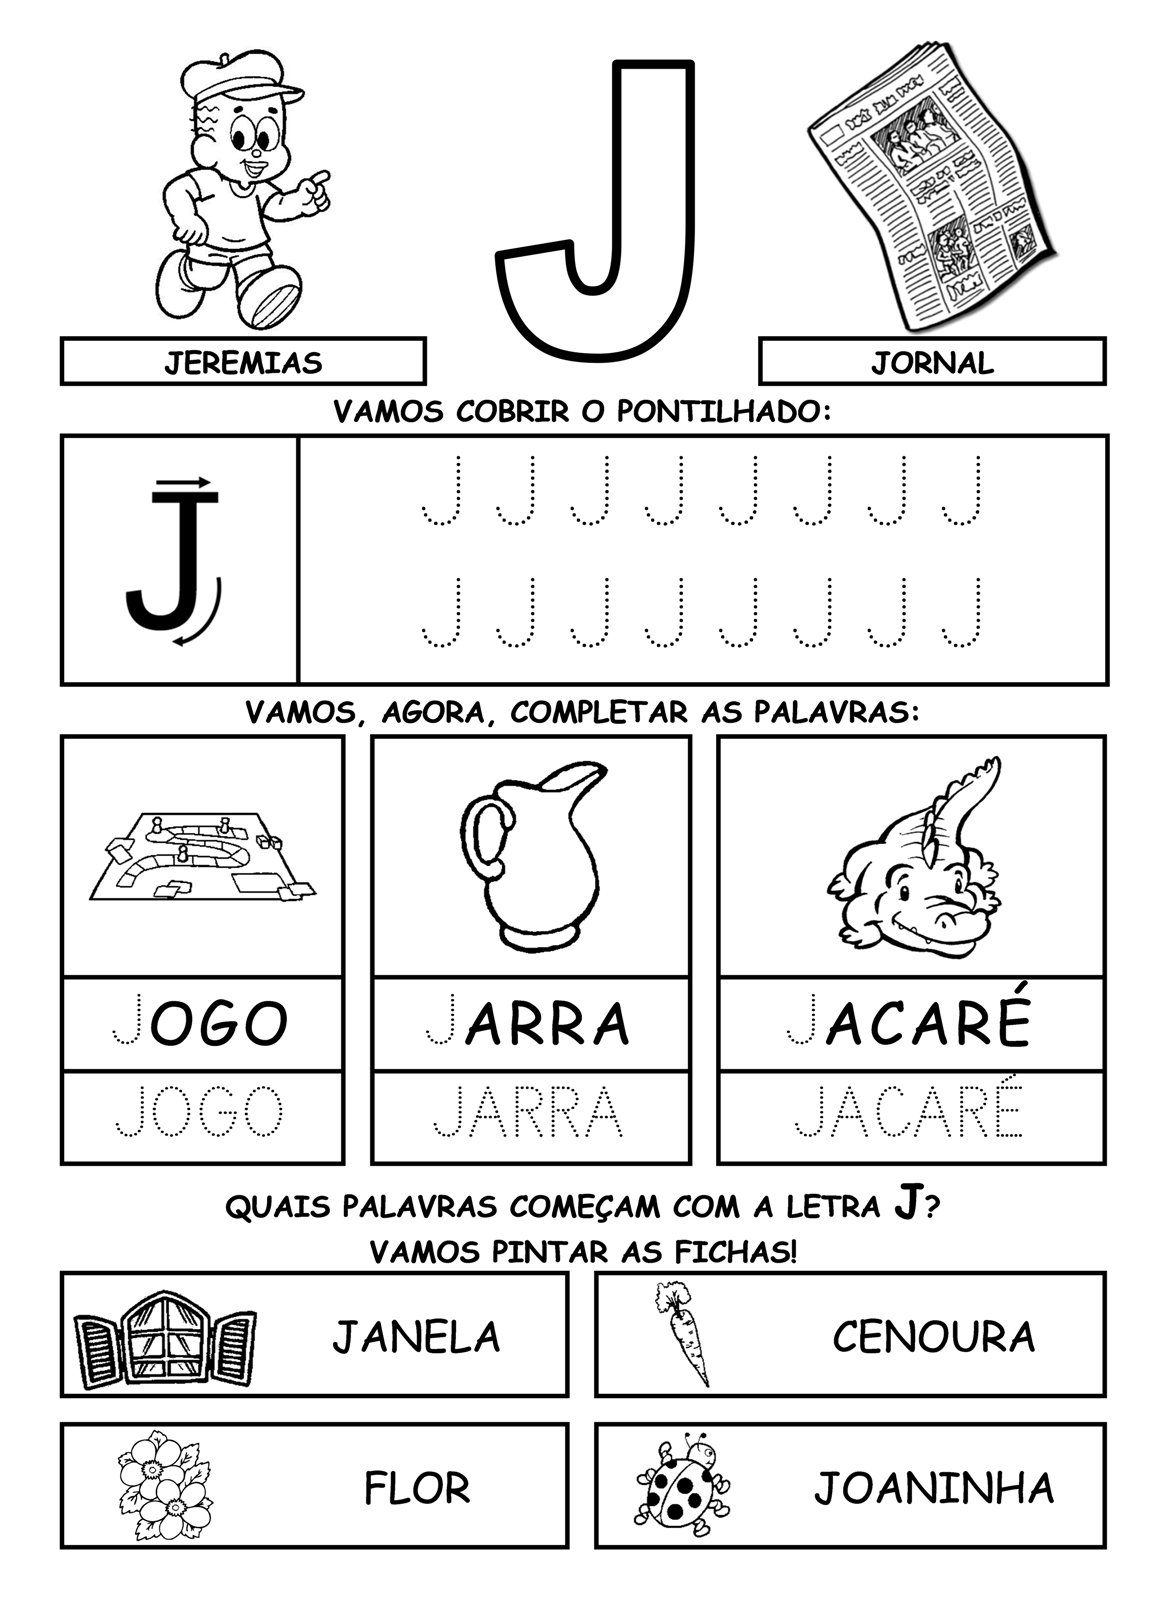 Pin de Fernanda en atividades | Pinterest | Pedagogia, Alfabeto y ...